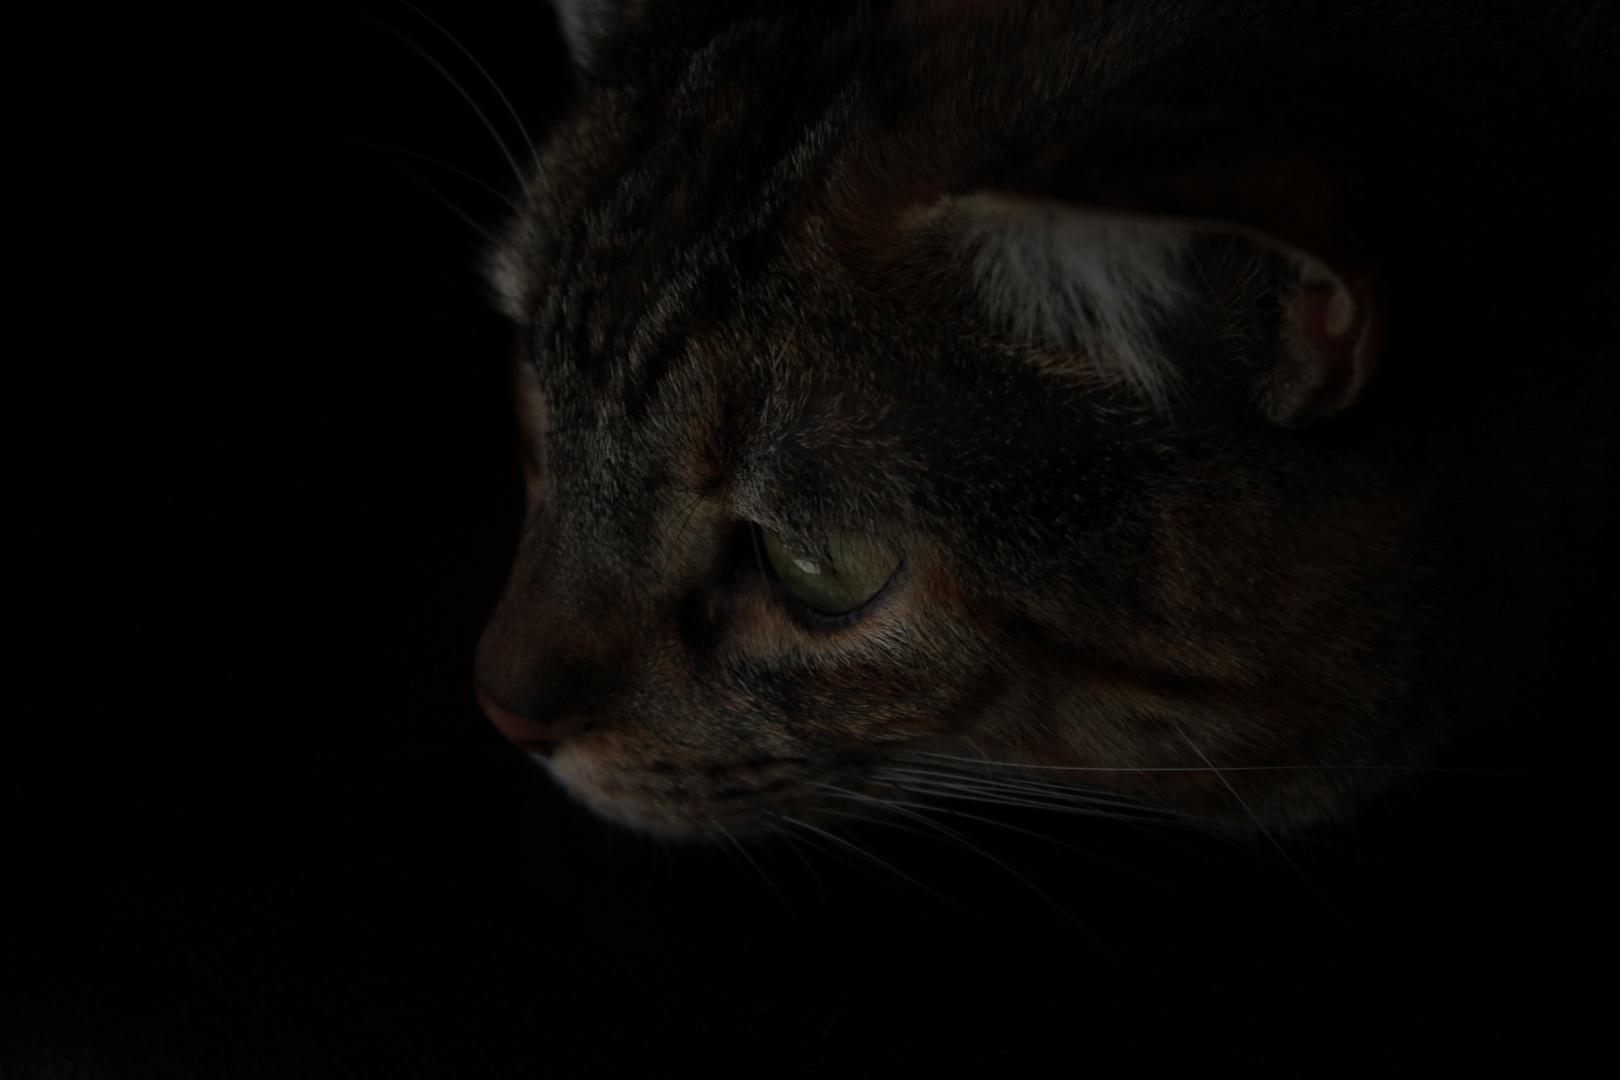 Gato hermético